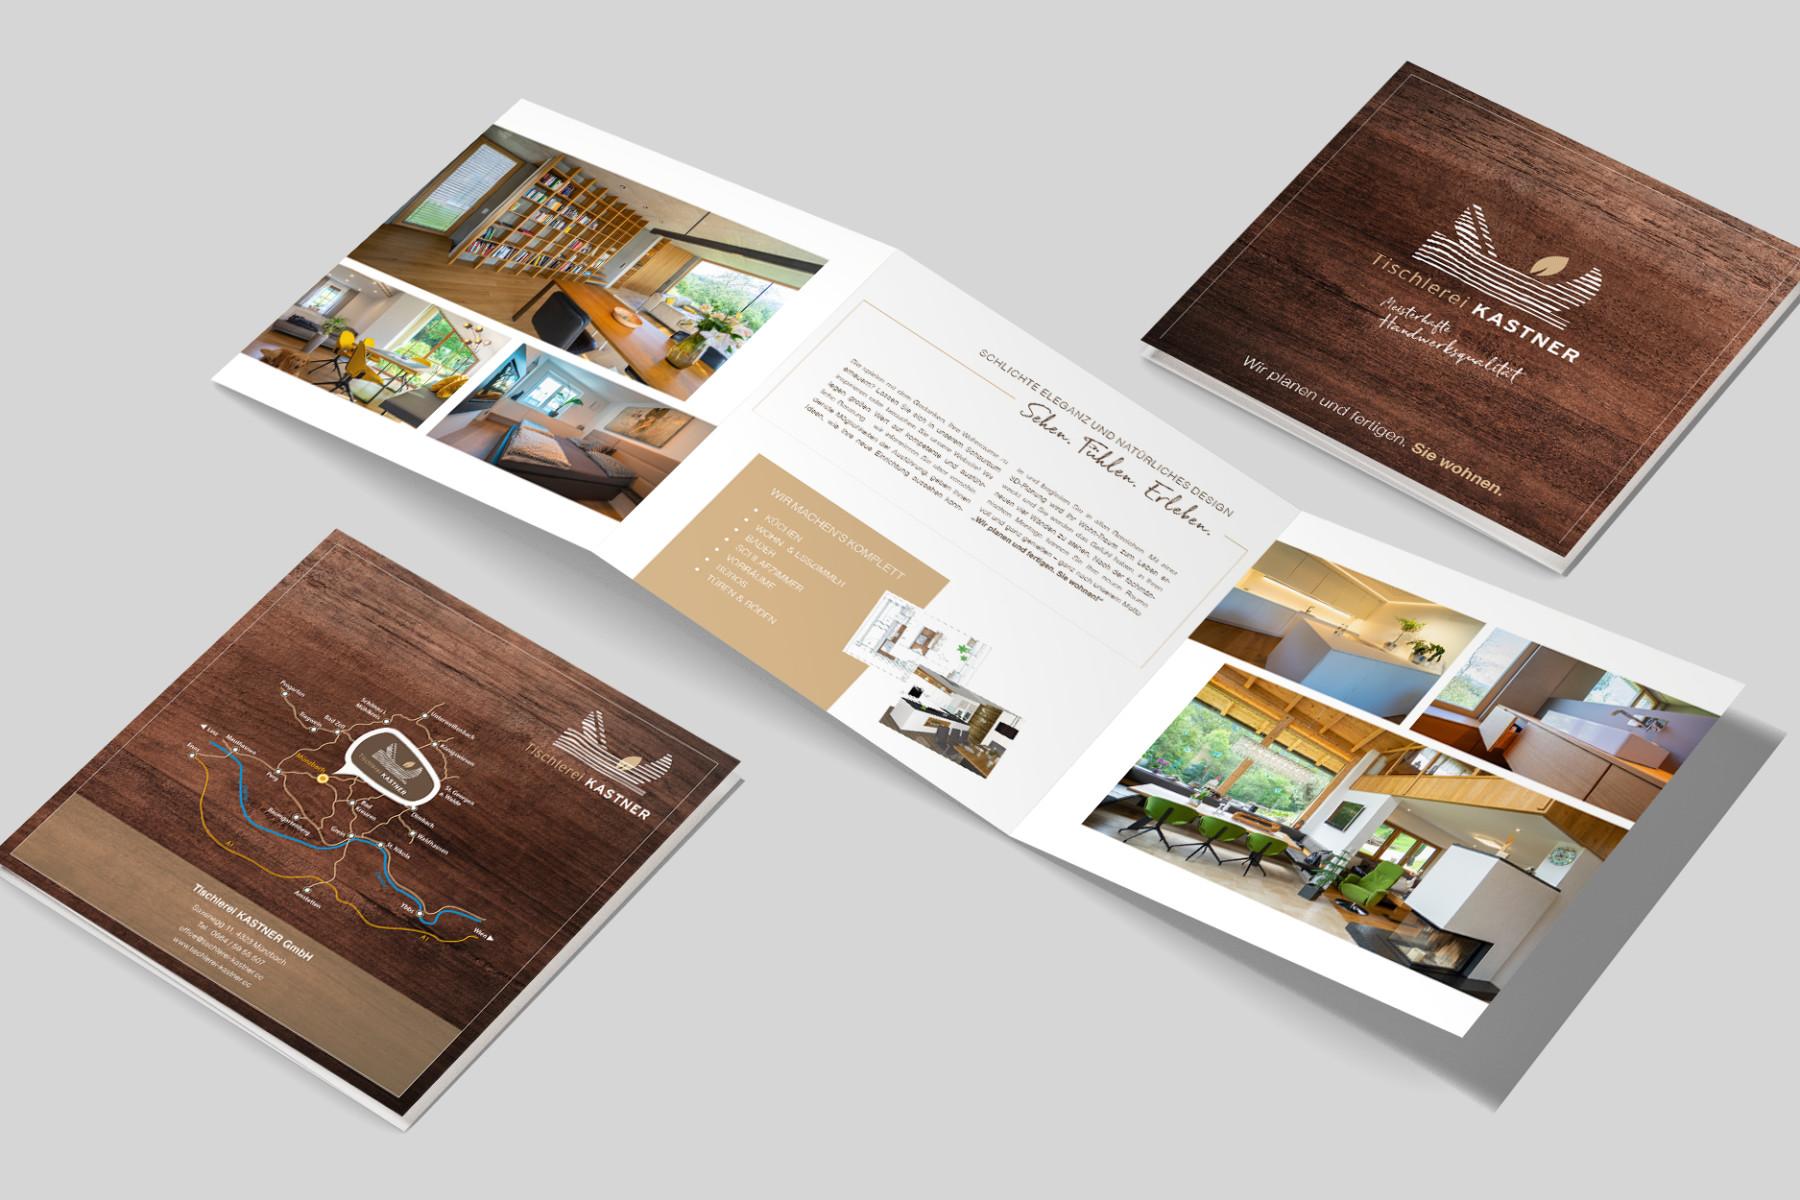 broschüre-tischlerei-kastner-b2-werbeagentur